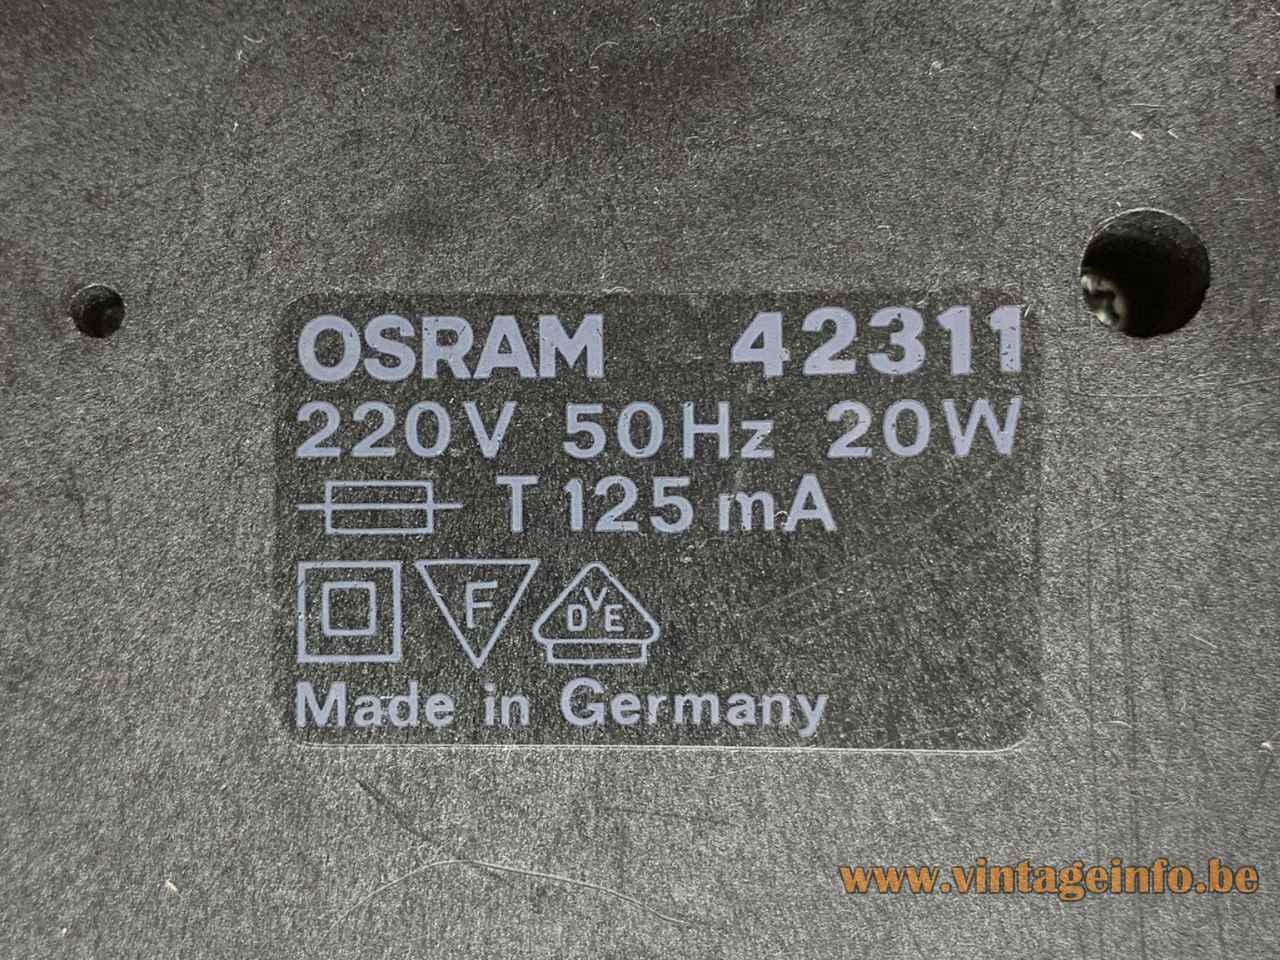 Osram 42311 cube spotlight square black plastic base bottom label 1970s Germany 220 volt 20 watt